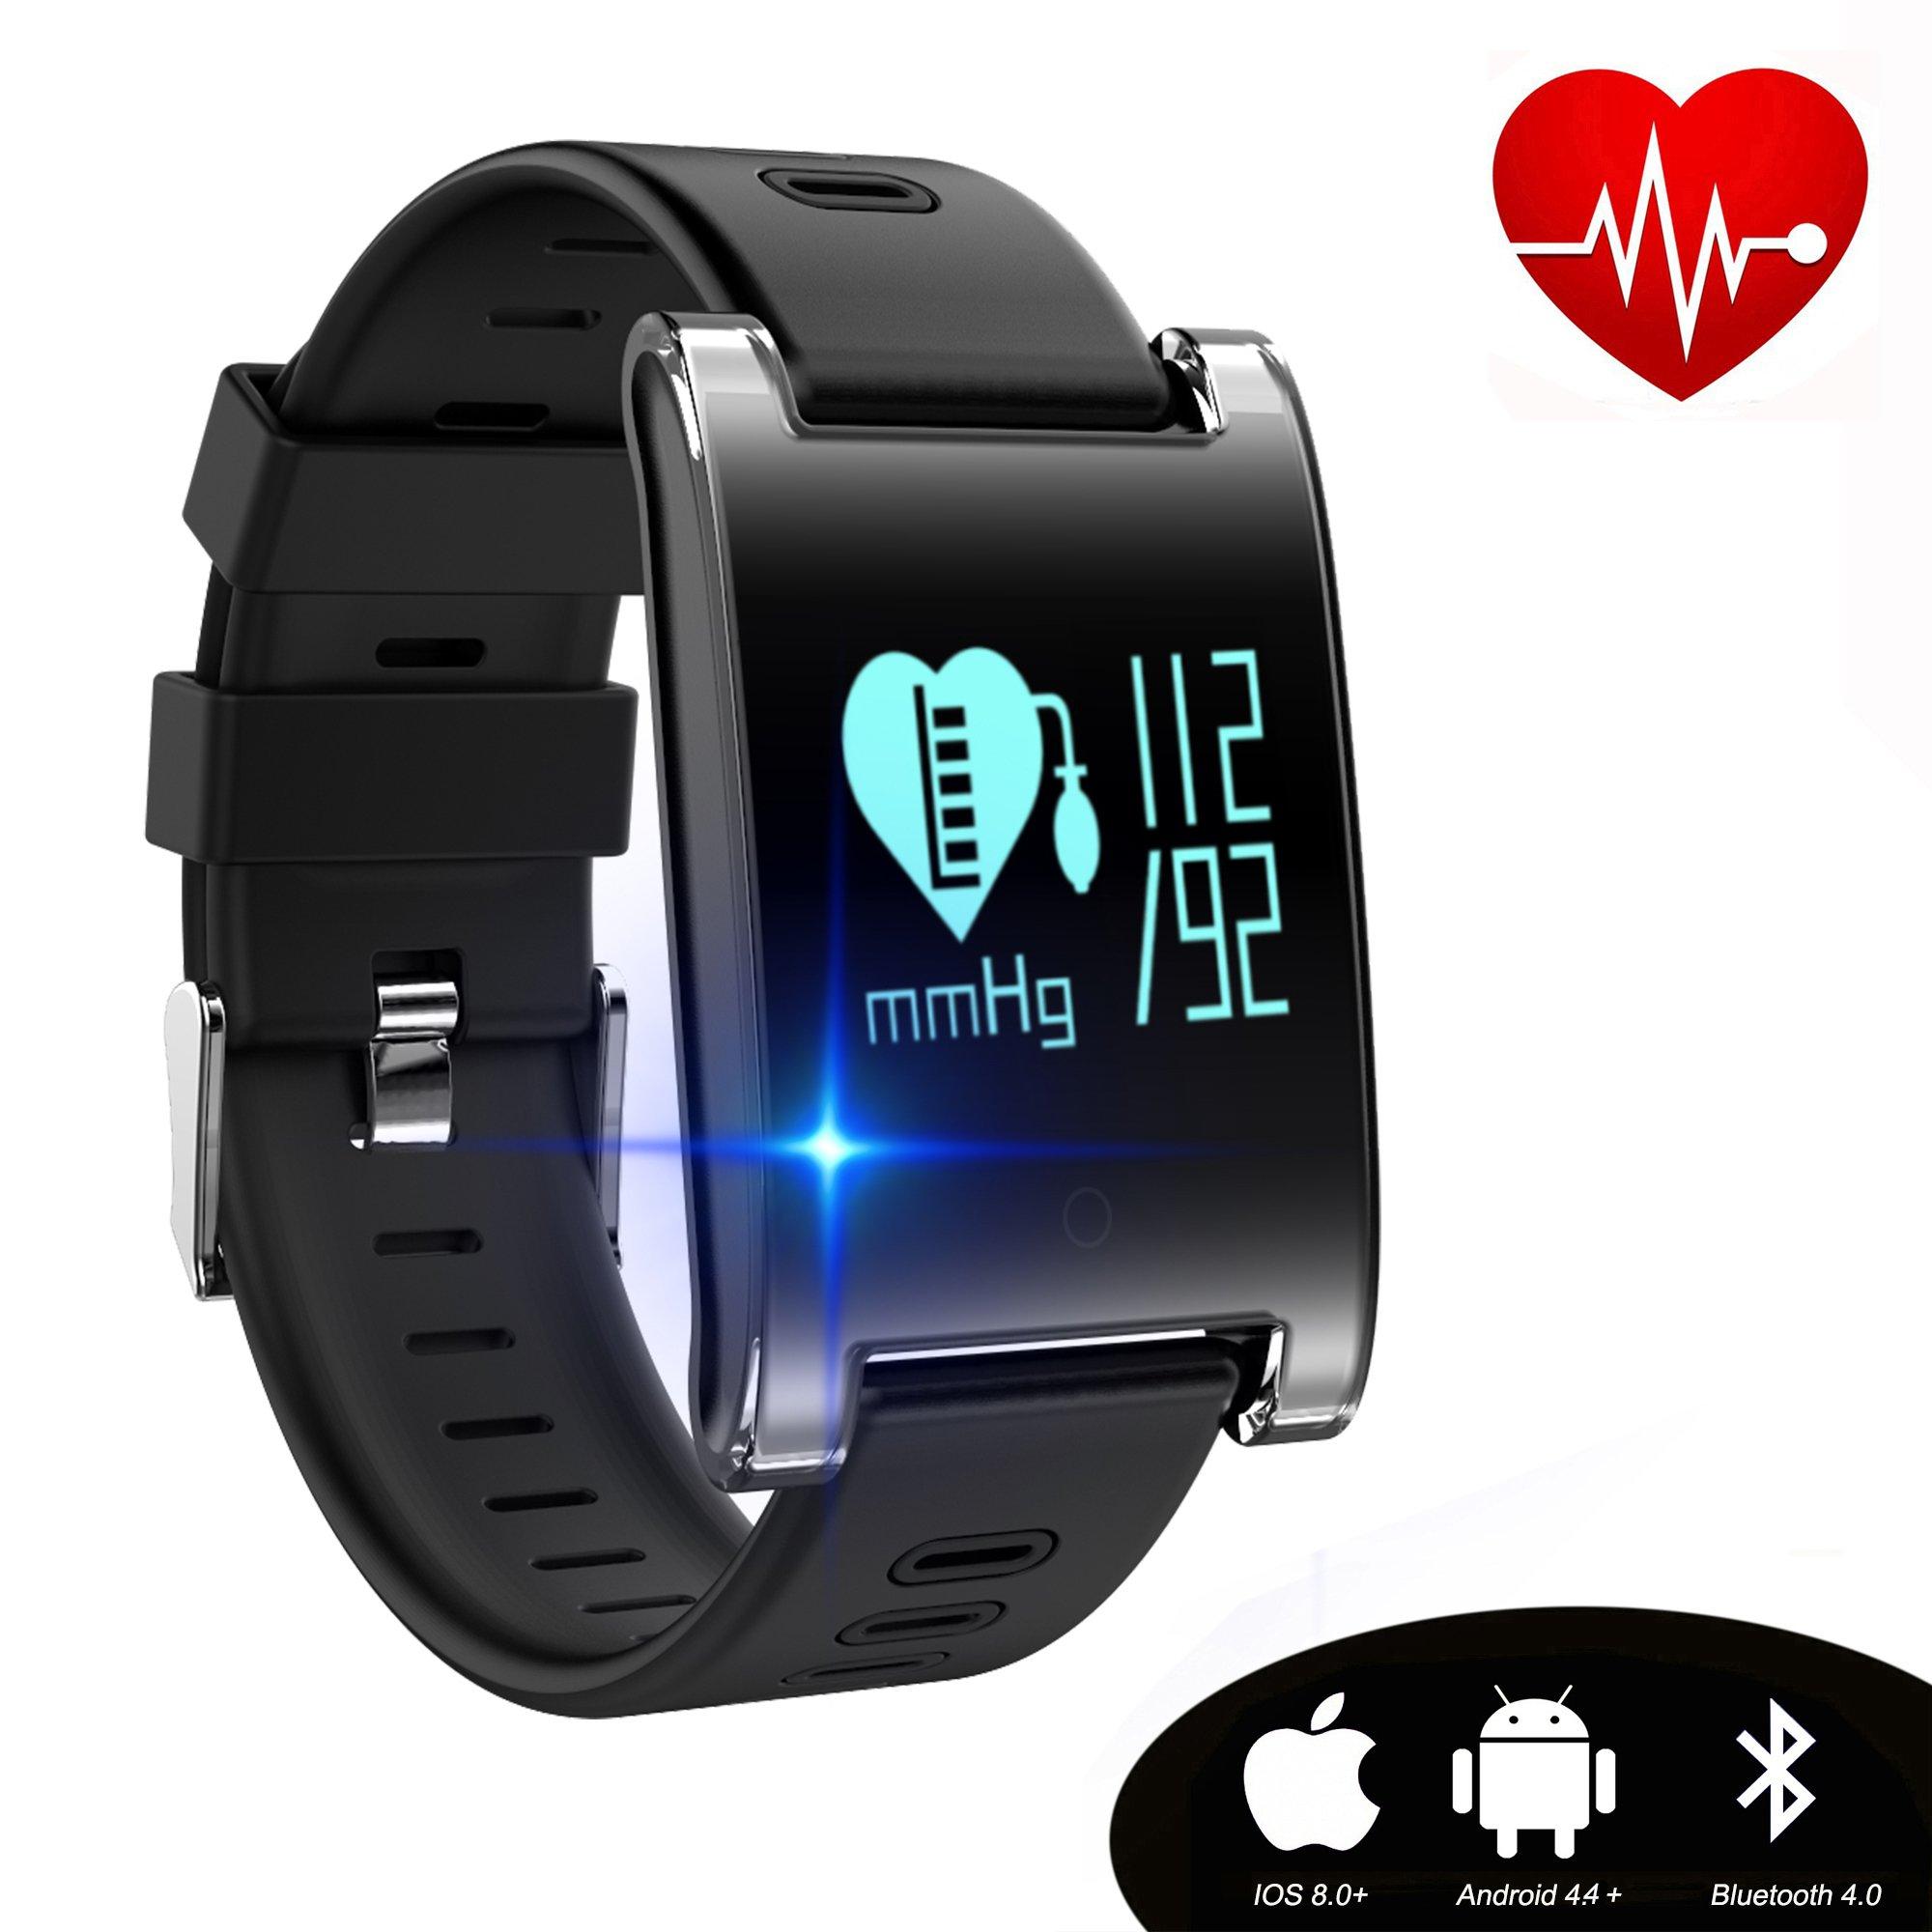 kingkok Blood Pressure Monitor Touch Screen Personal Fitness Tracker Waterproof Pedometer Heart Rate Activity Tracker Watch [Black]